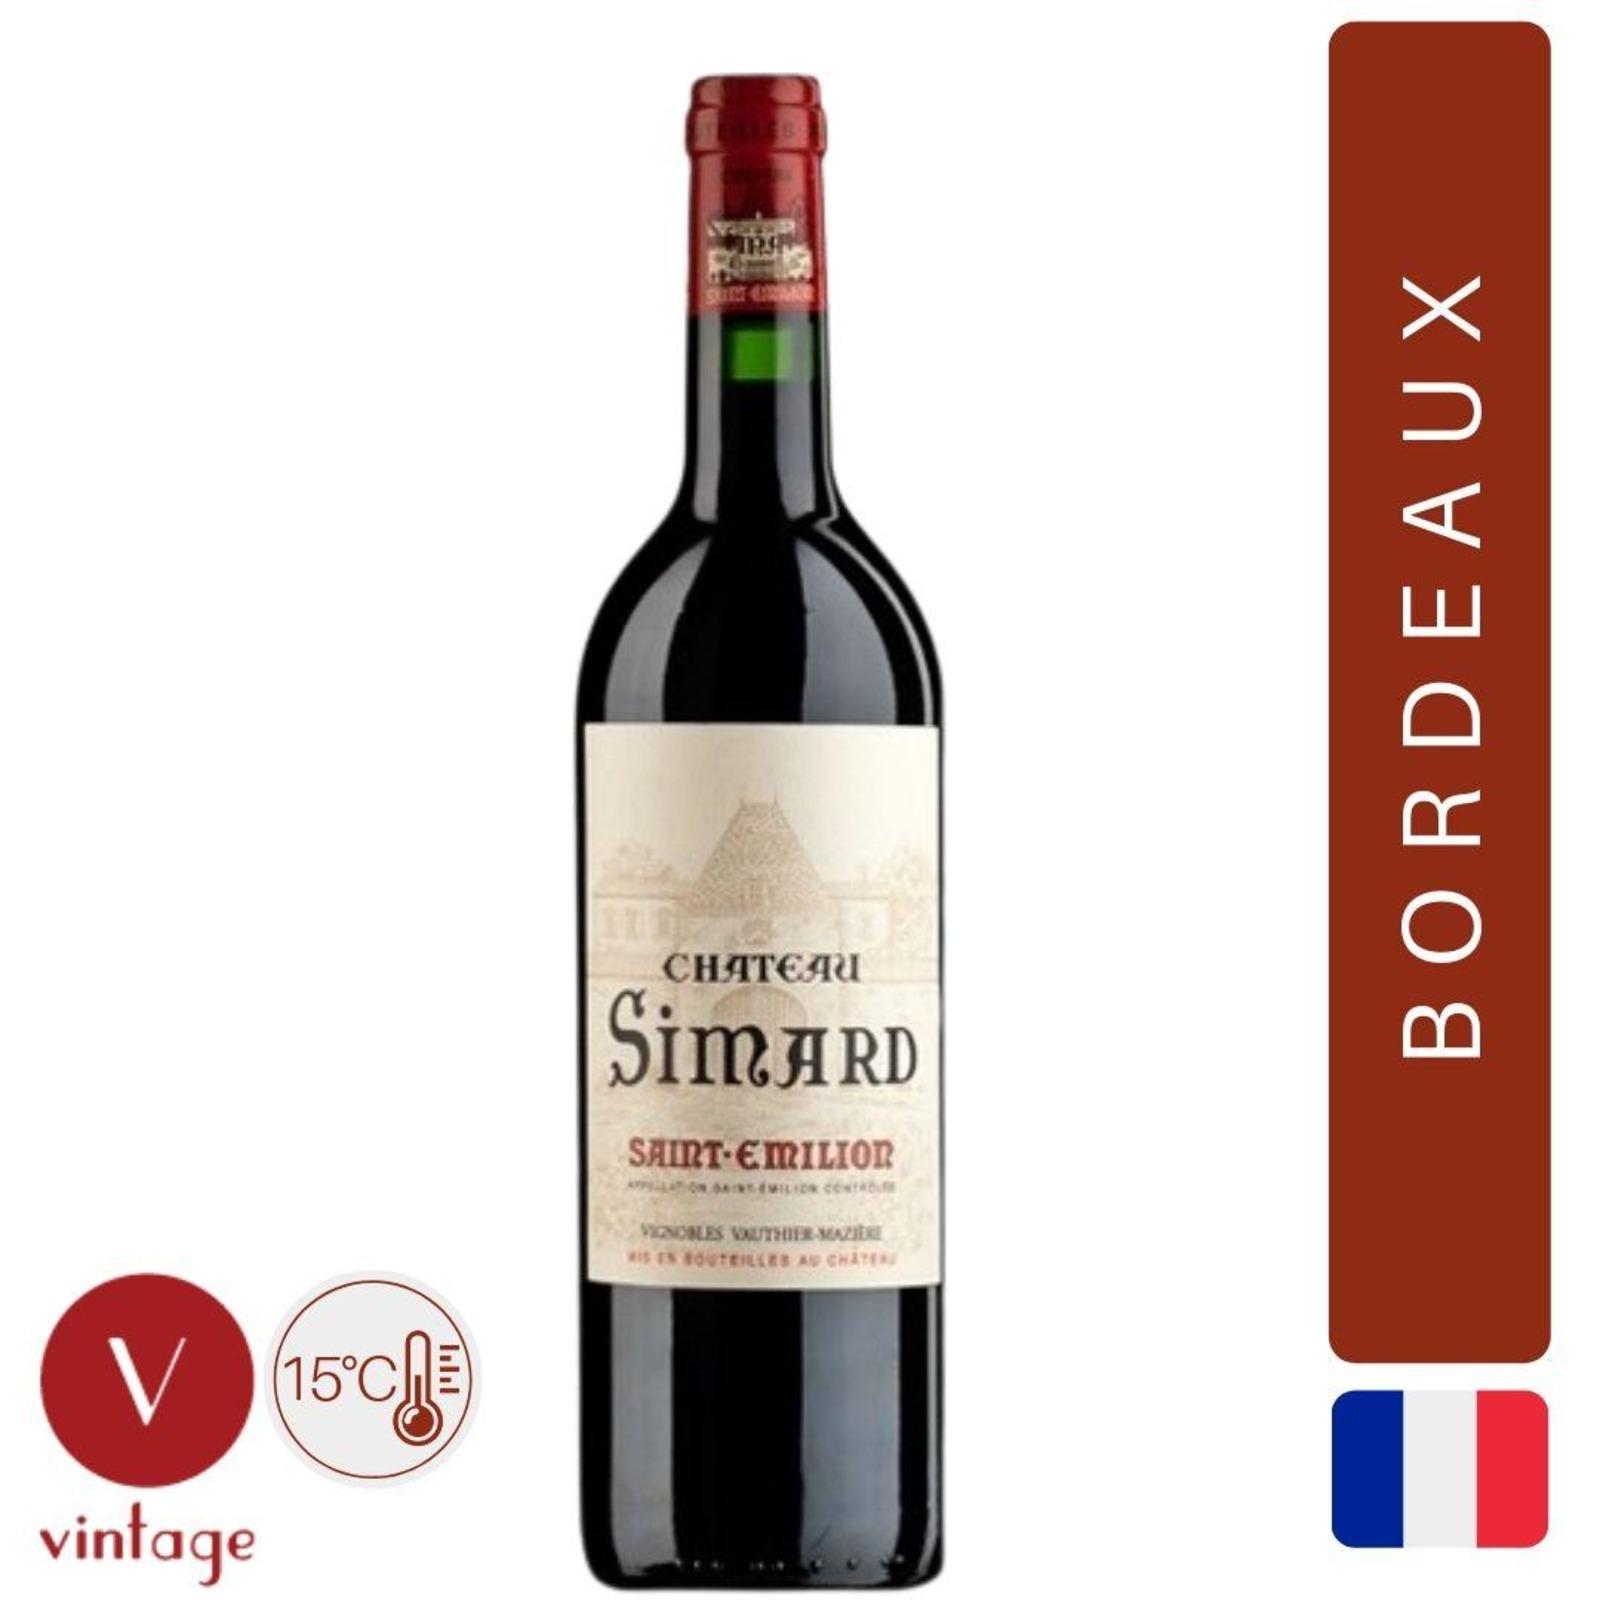 Chateau Simard - Saint Emilion Grand Cru - Bordeaux Red Wine